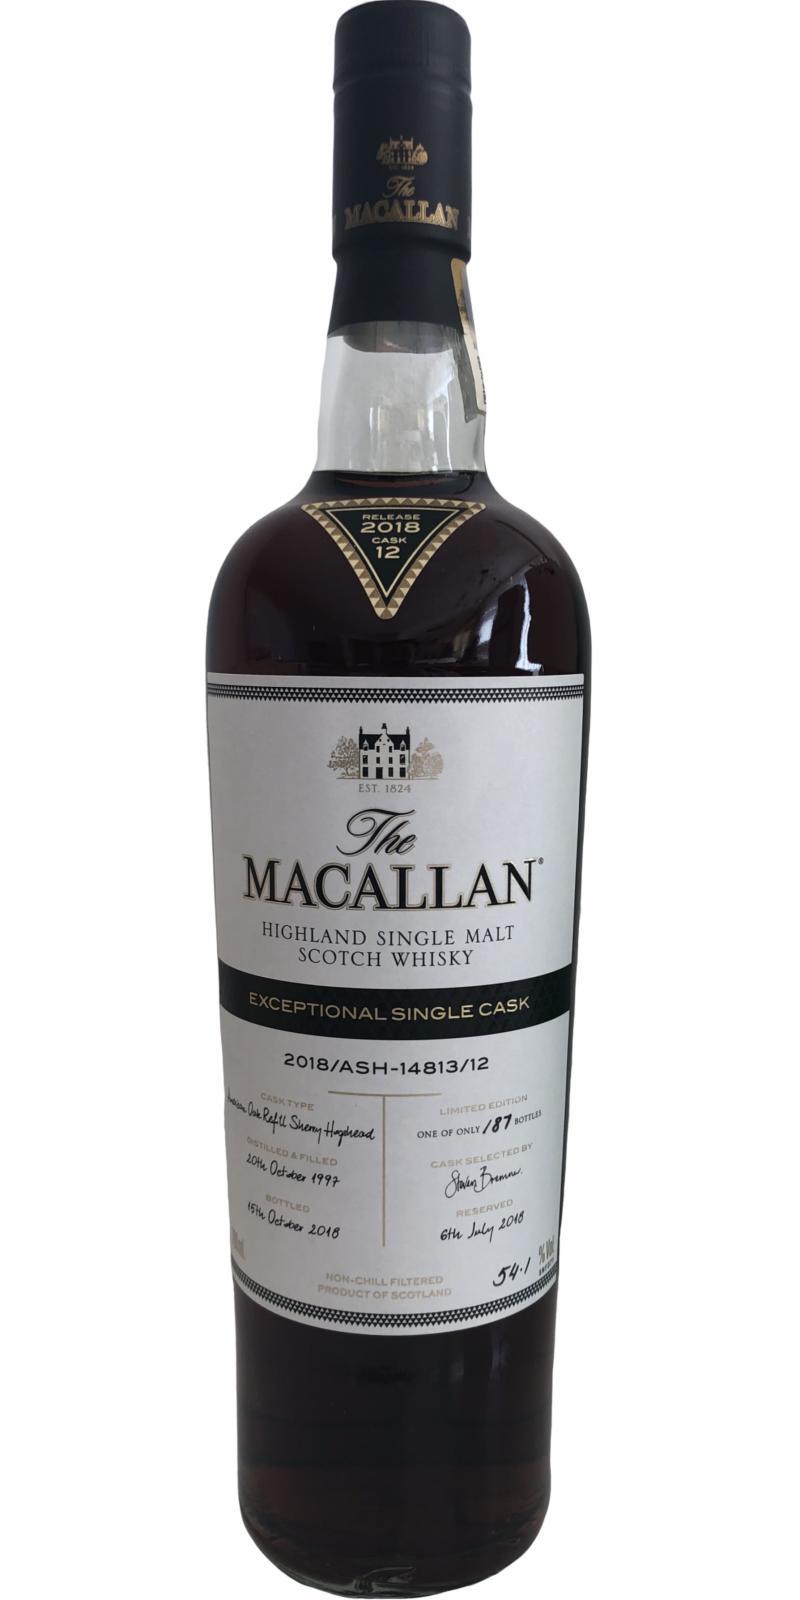 Macallan 2018/ASH–14813/12